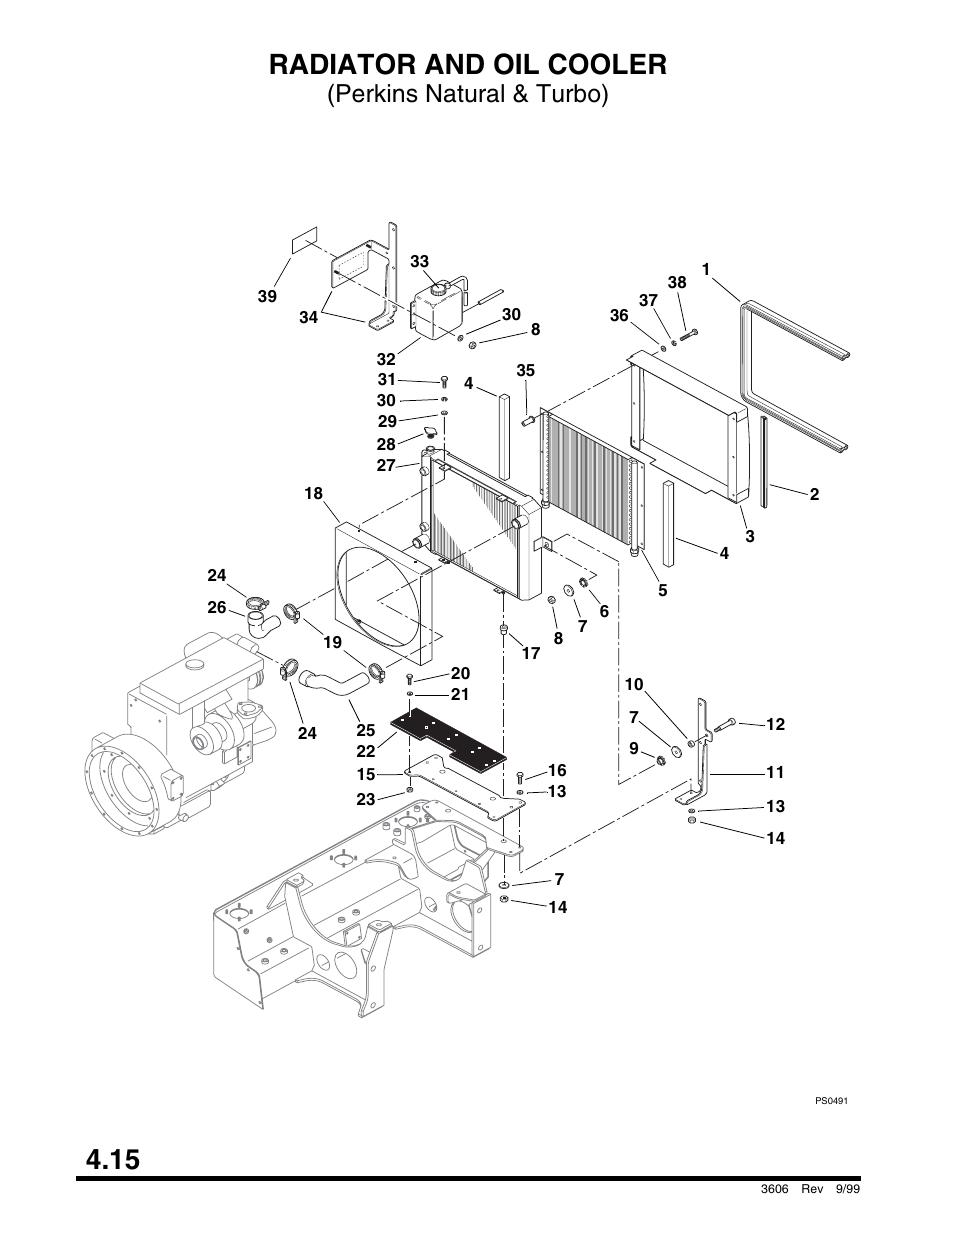 Radiator and oil cooler (perkins natural & turbo), Valve